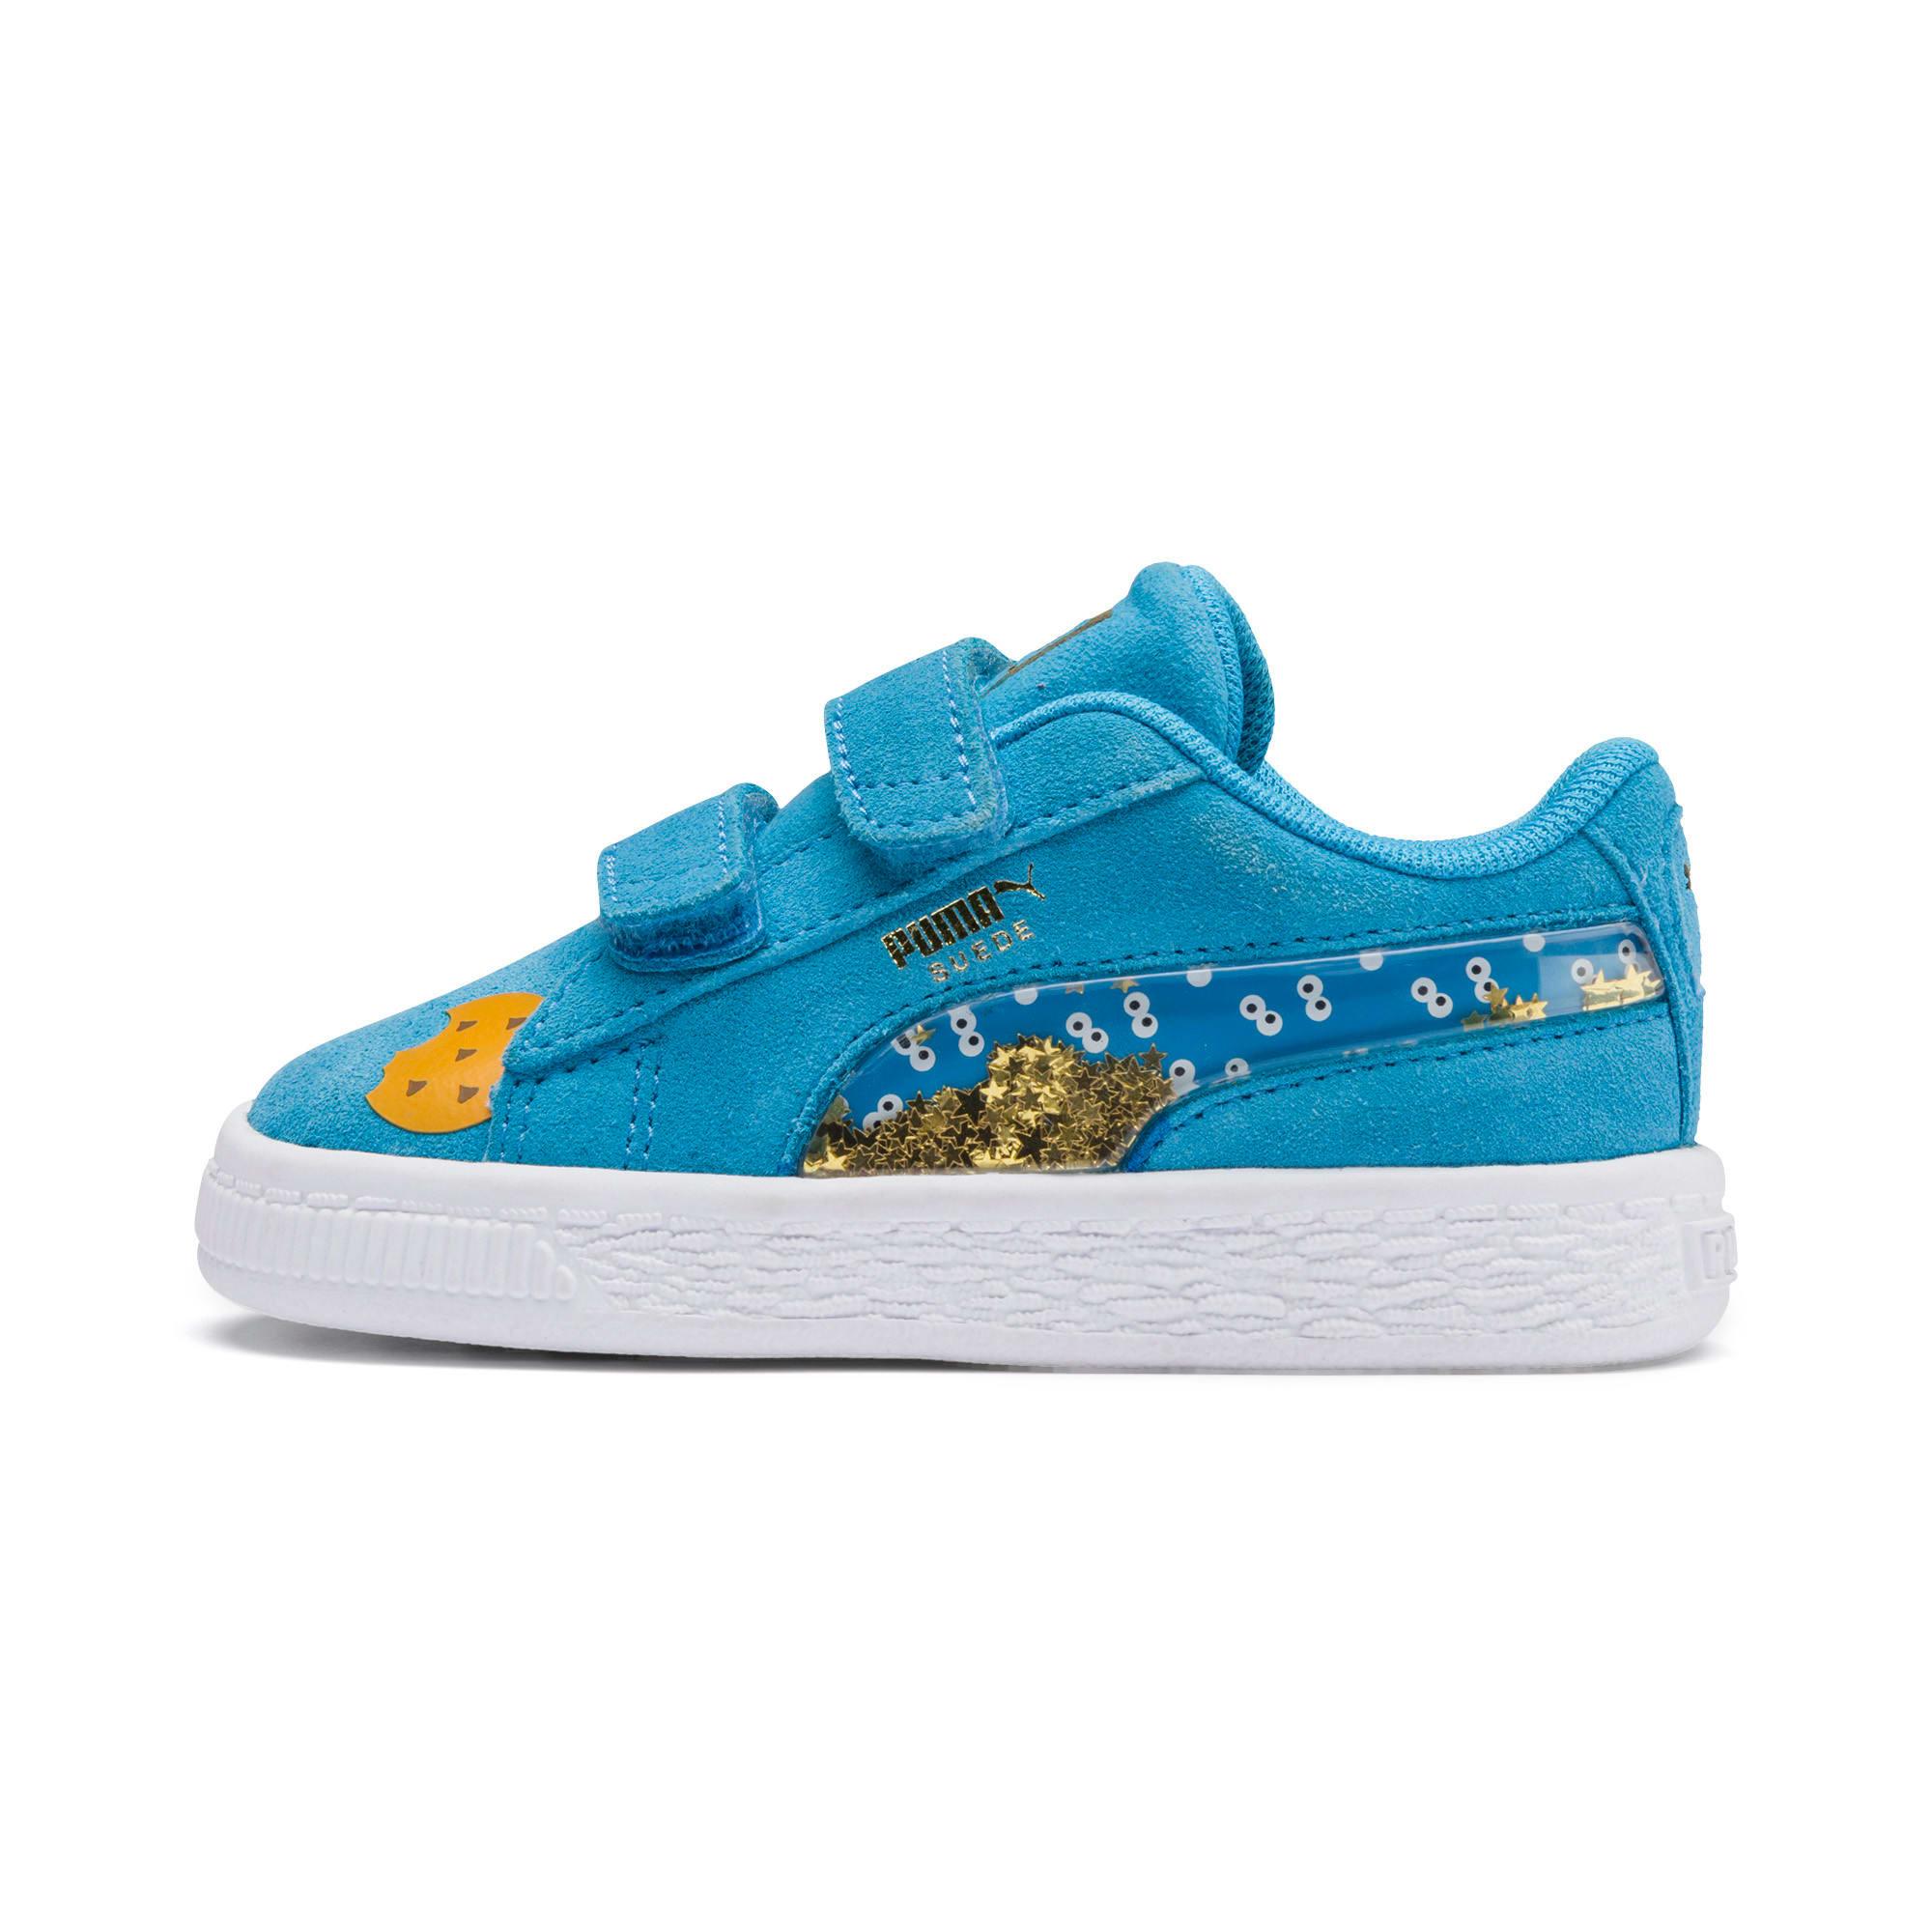 Thumbnail 1 of PUMA x SESAME STREET 50 Suede Statement Toddler Shoes, Bleu Azur-Puma White, medium